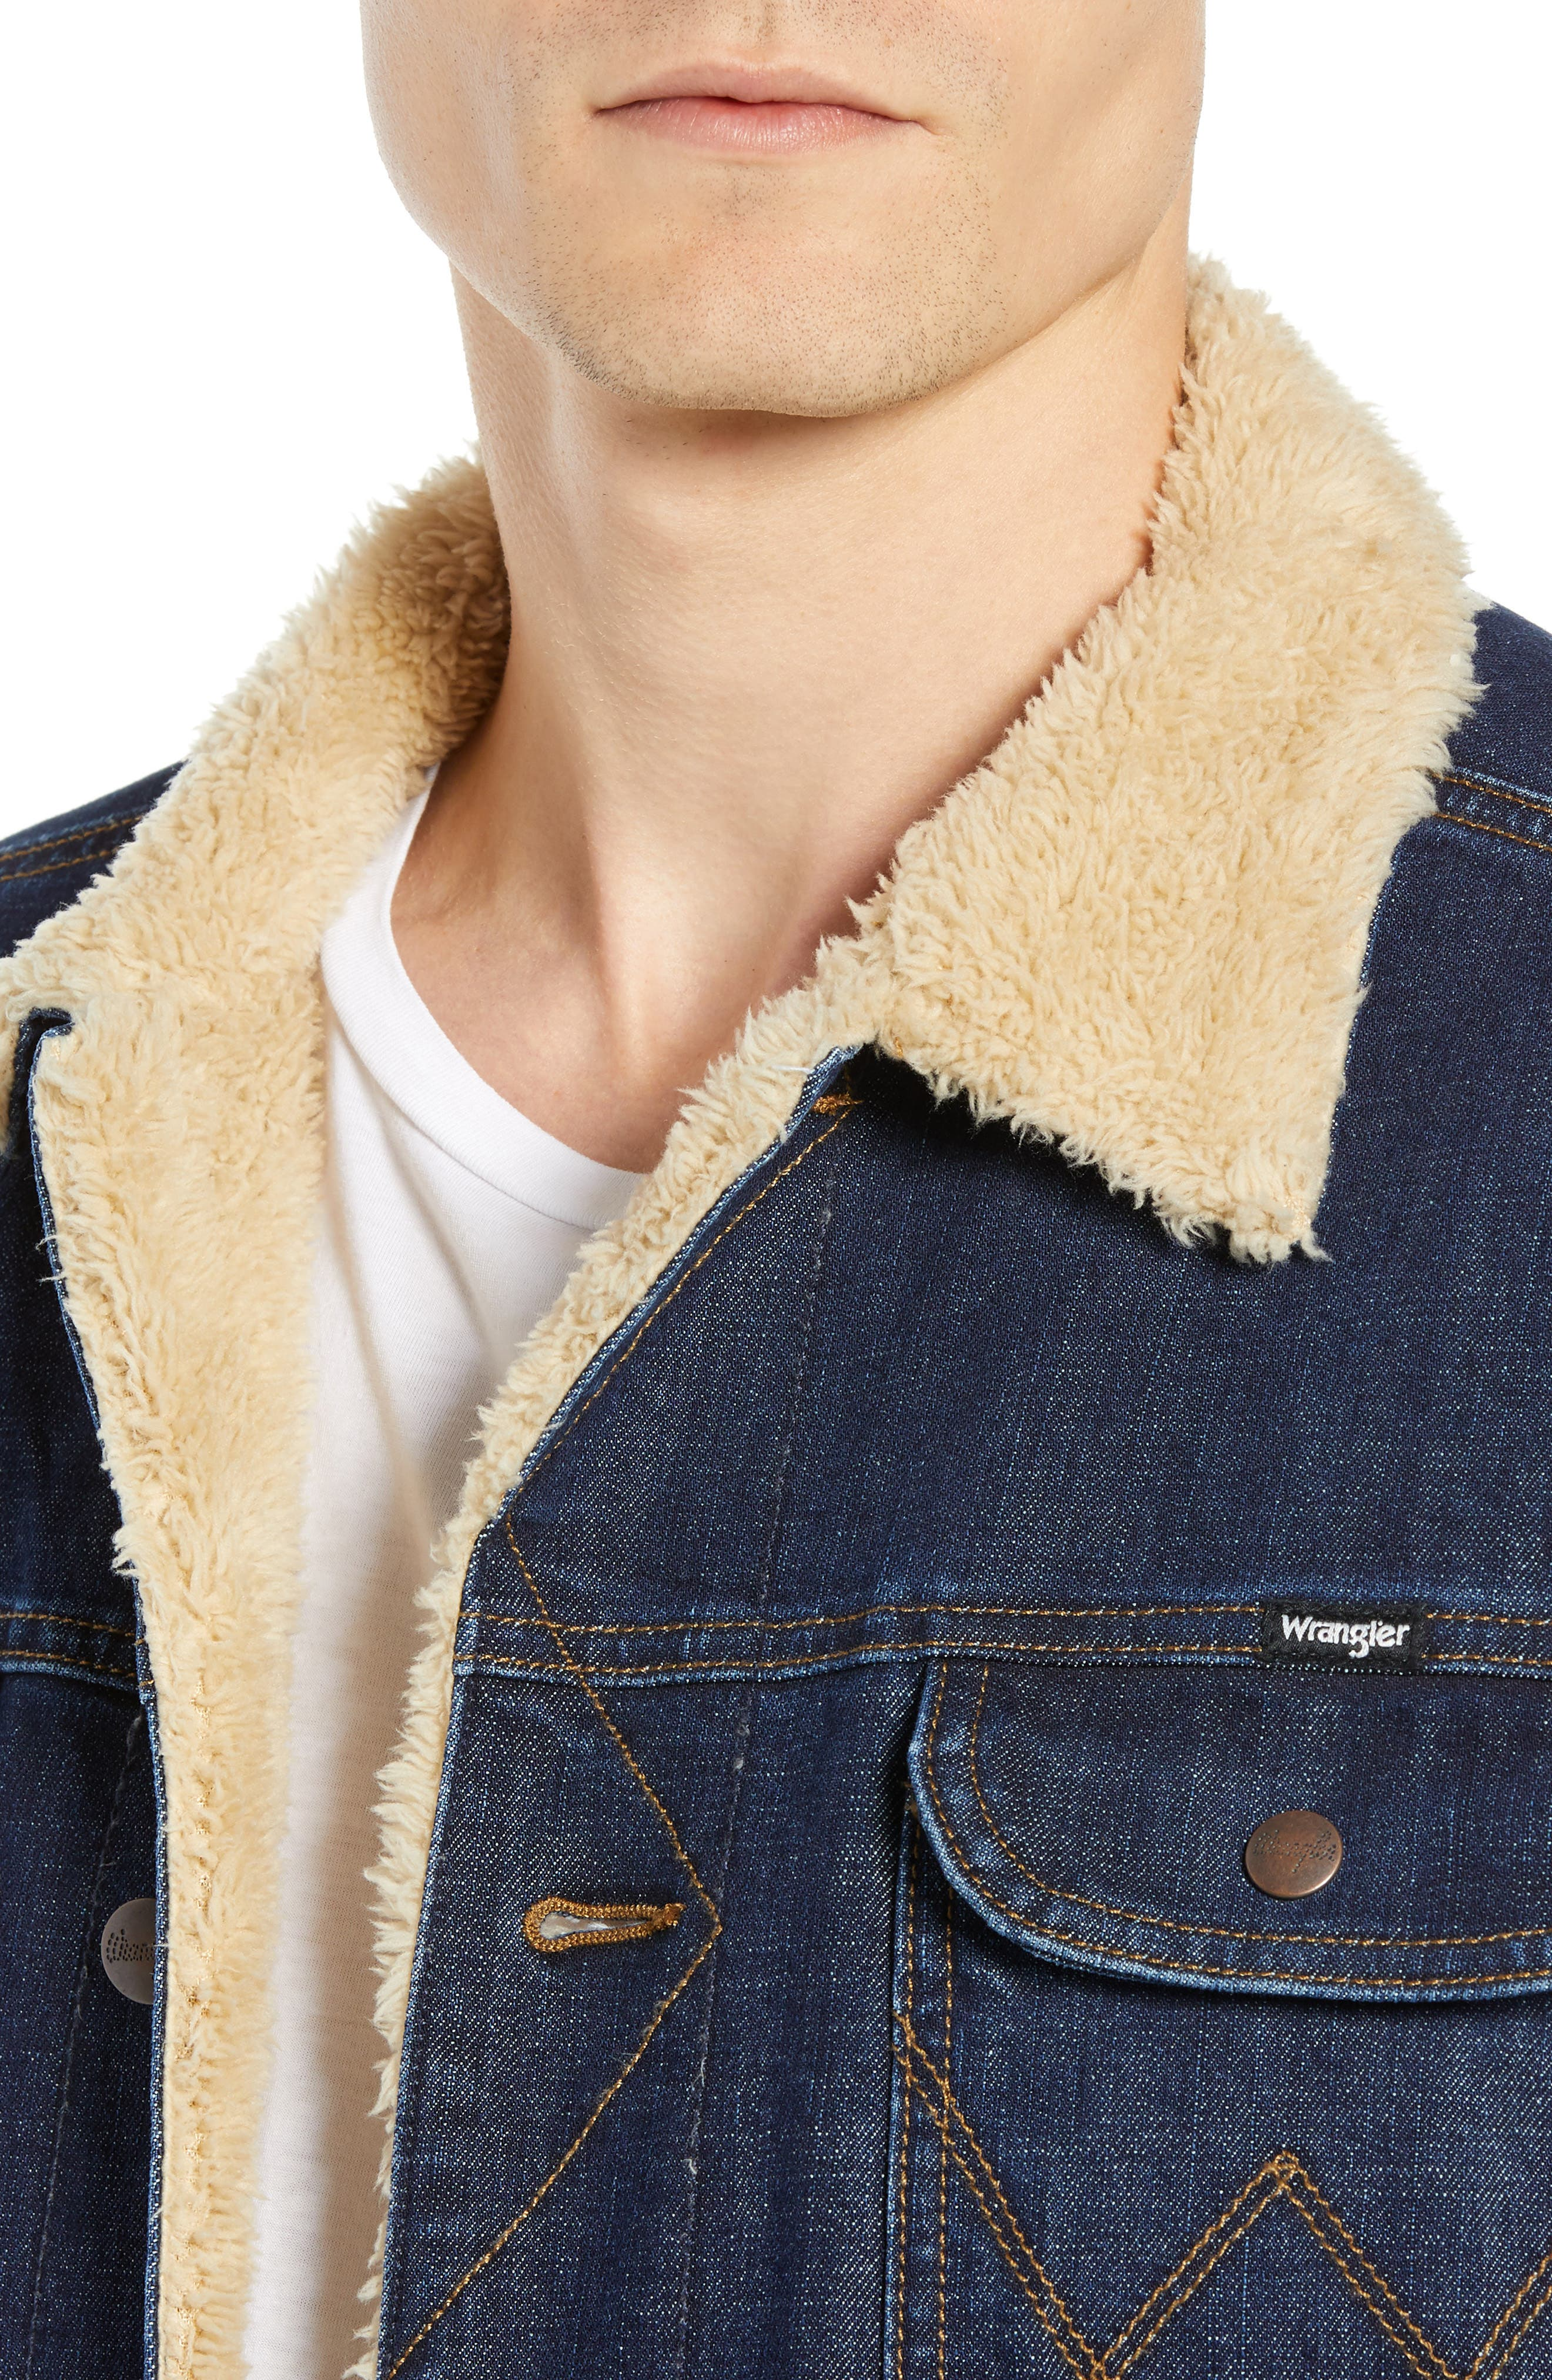 WRANGLER,                             Heritage Fleece Lined Denim Jacket,                             Alternate thumbnail 4, color,                             DARK